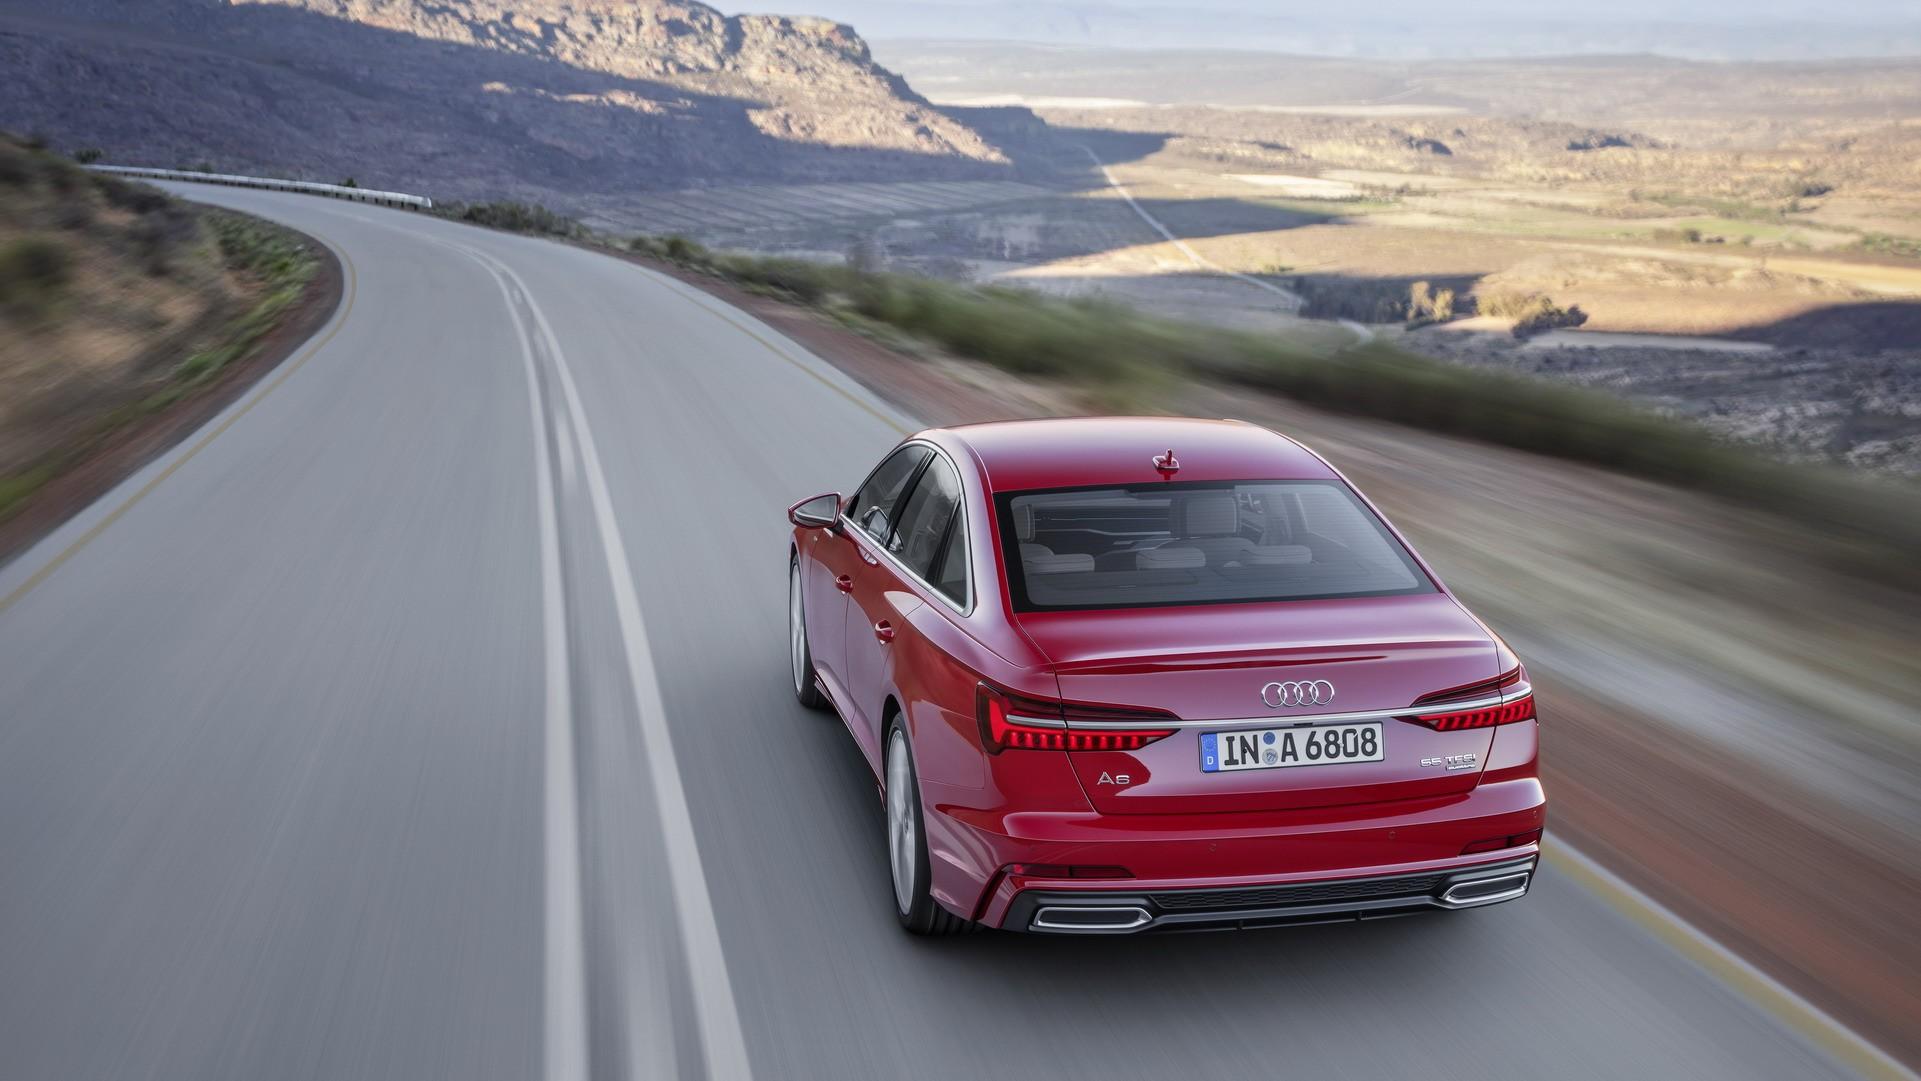 Audi A6 Gets Bang & Olufsen Advanced Sound System